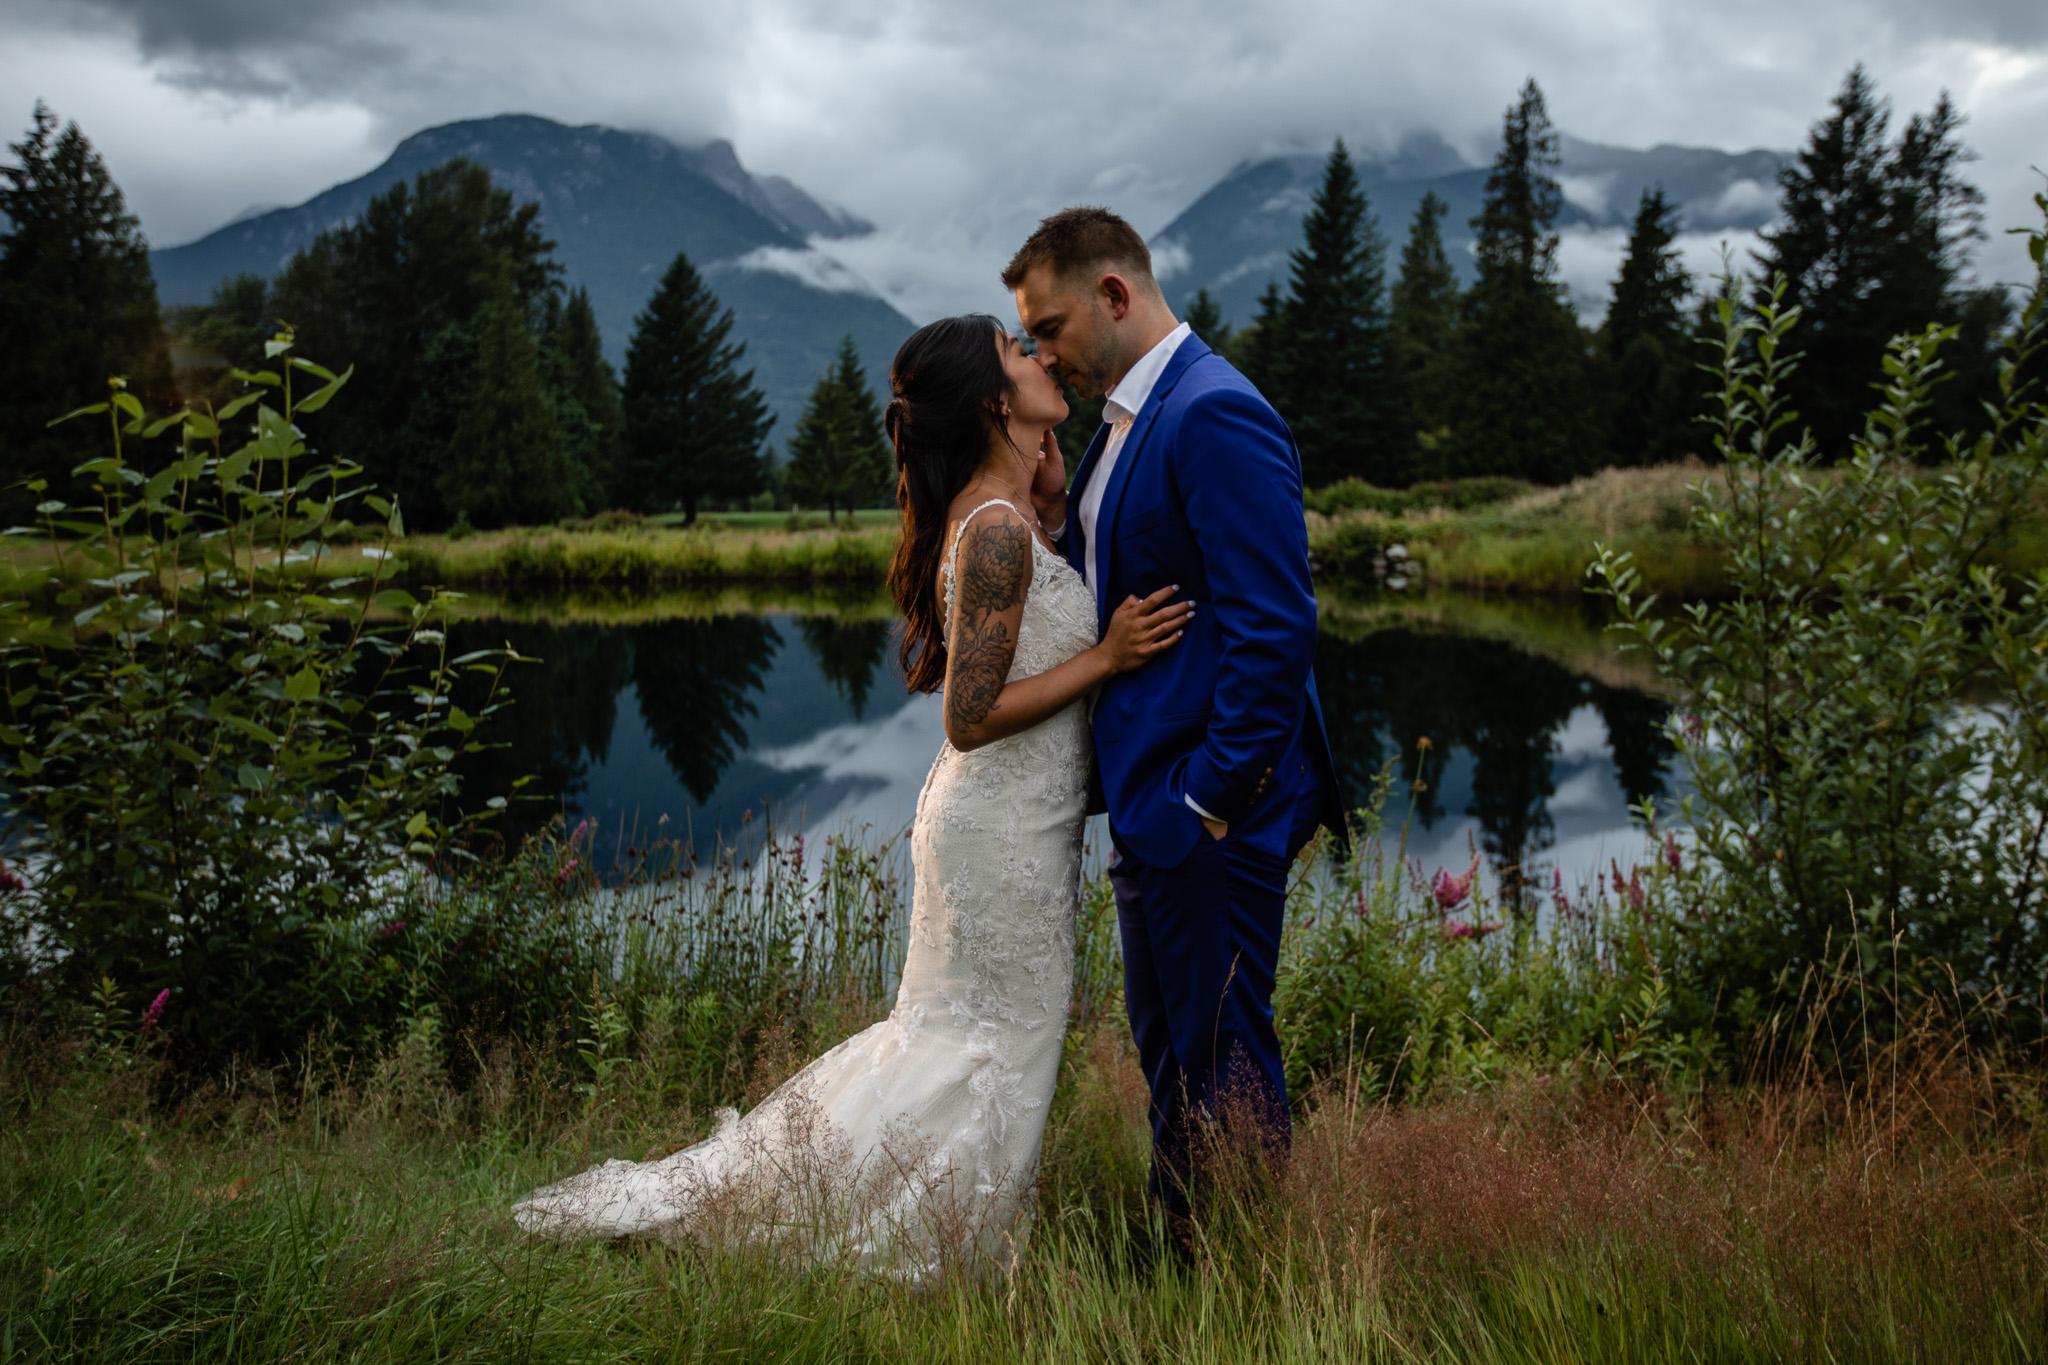 Squamish BC Wedding Photographer The Chief -003.jpg